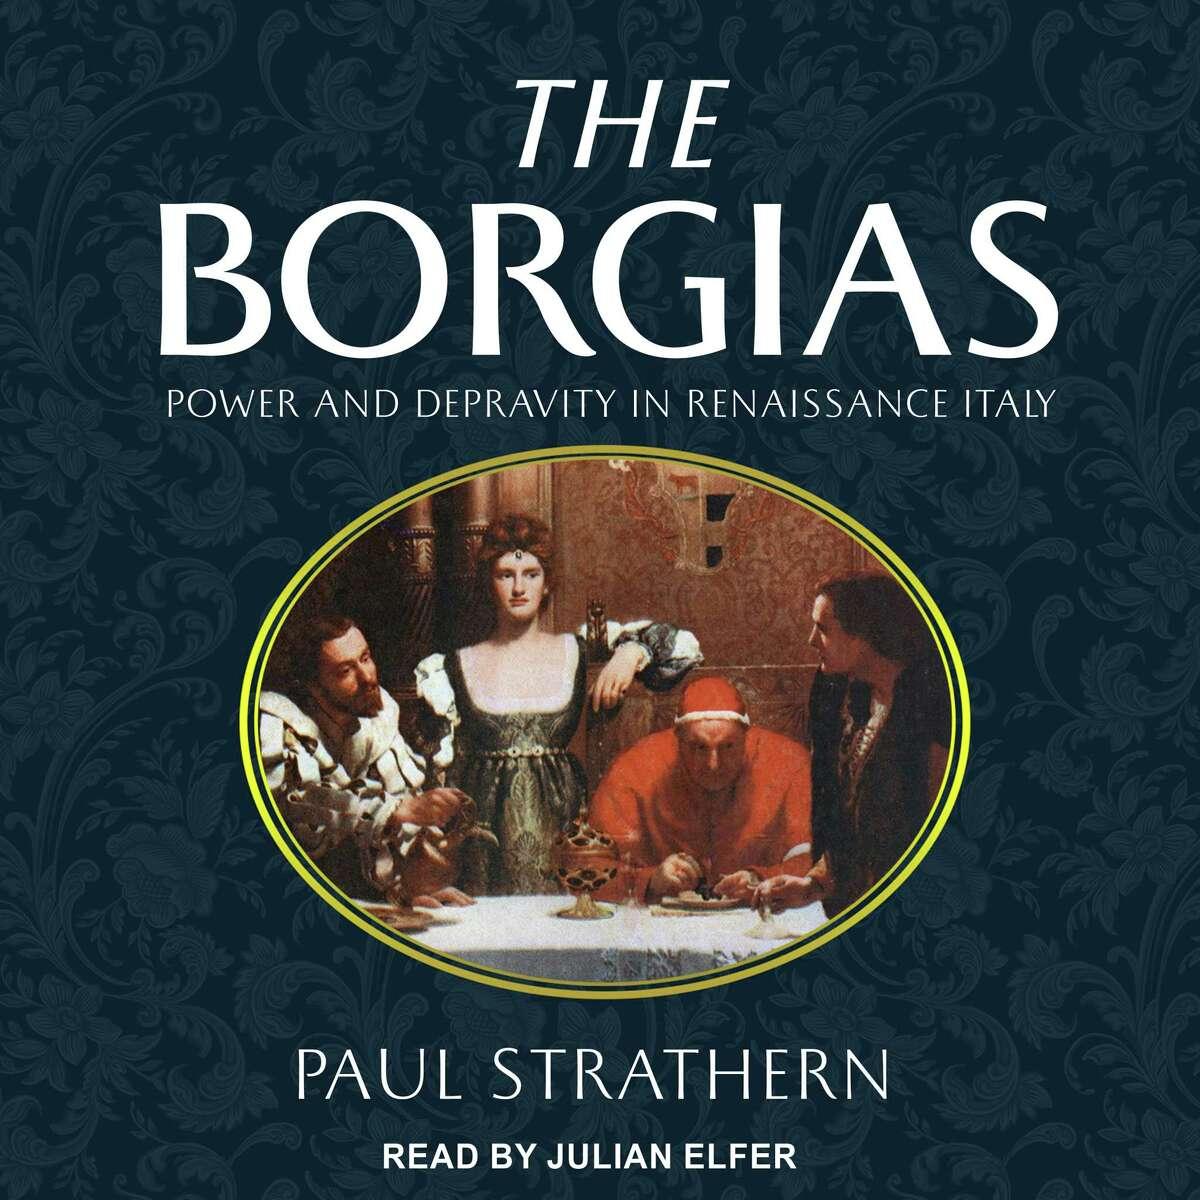 The Borgias: Power and Depravity in Renaissance Italy